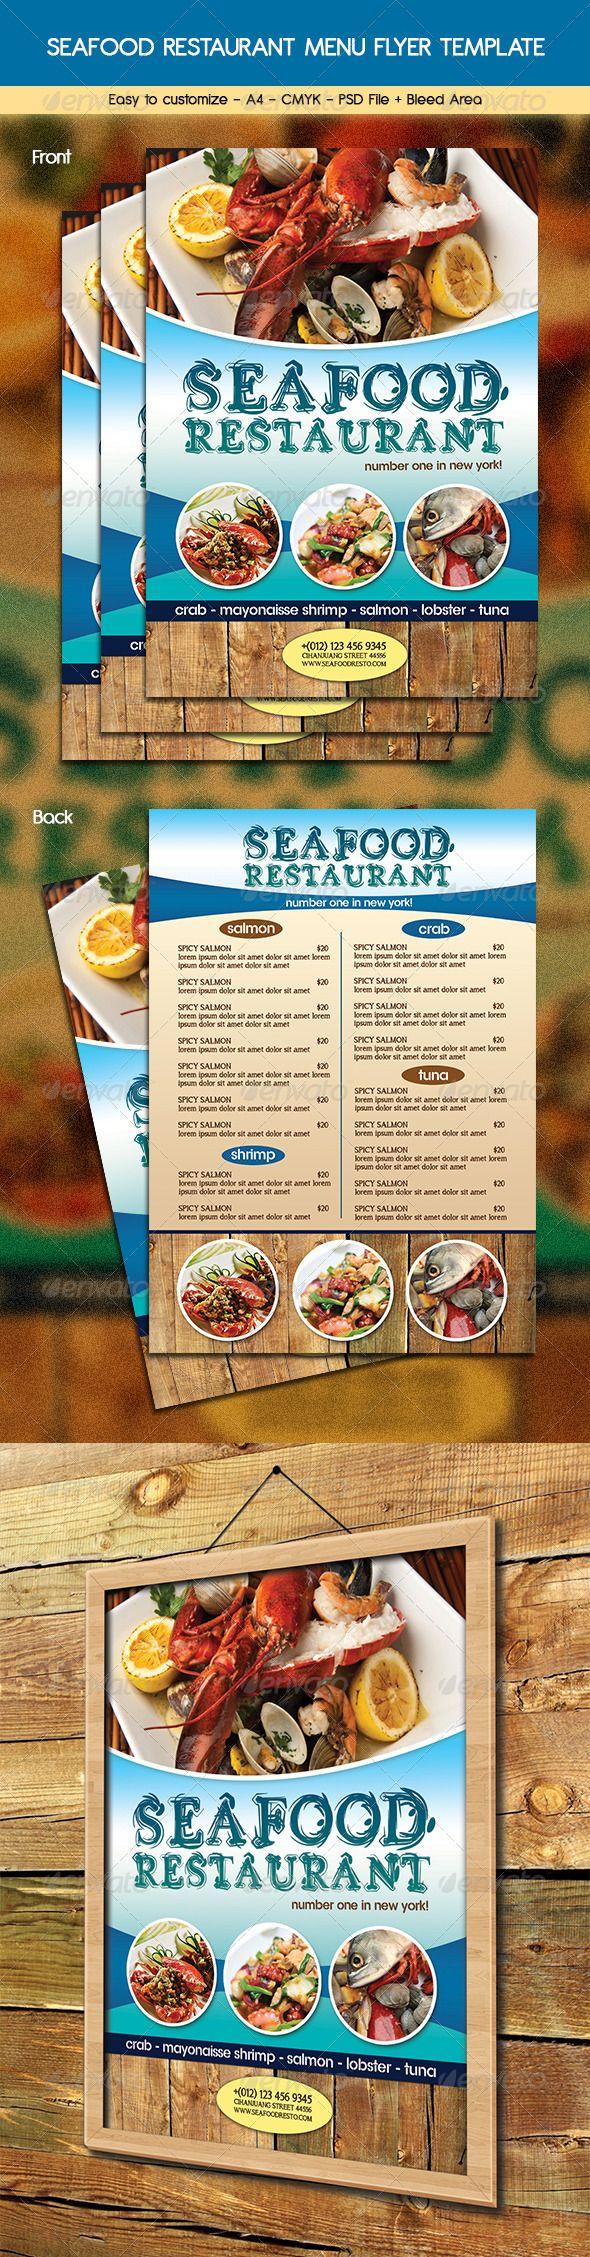 Seafood Restaurant Menu Flyer  Seafood Restaurant Food Menu And Menu